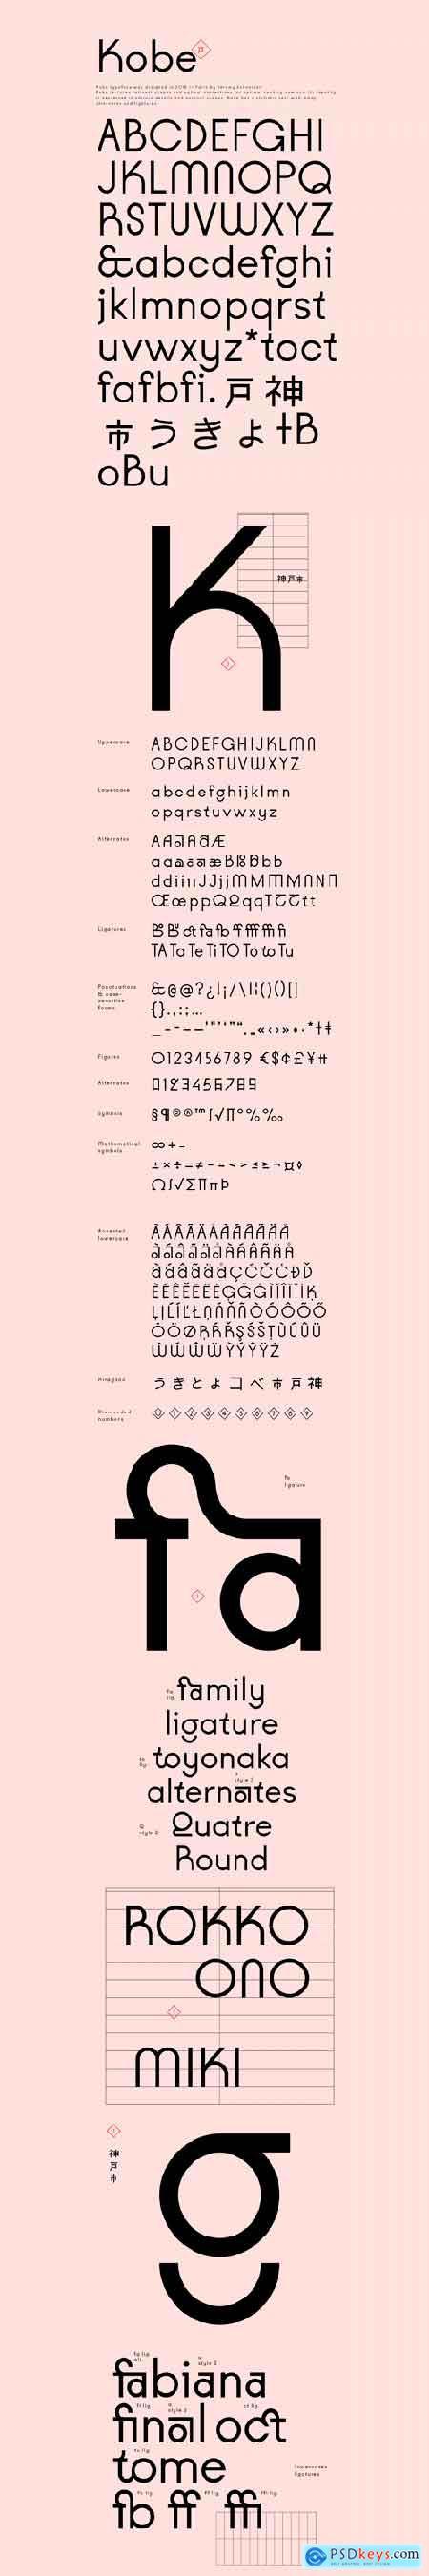 VJ Kobe Typeface